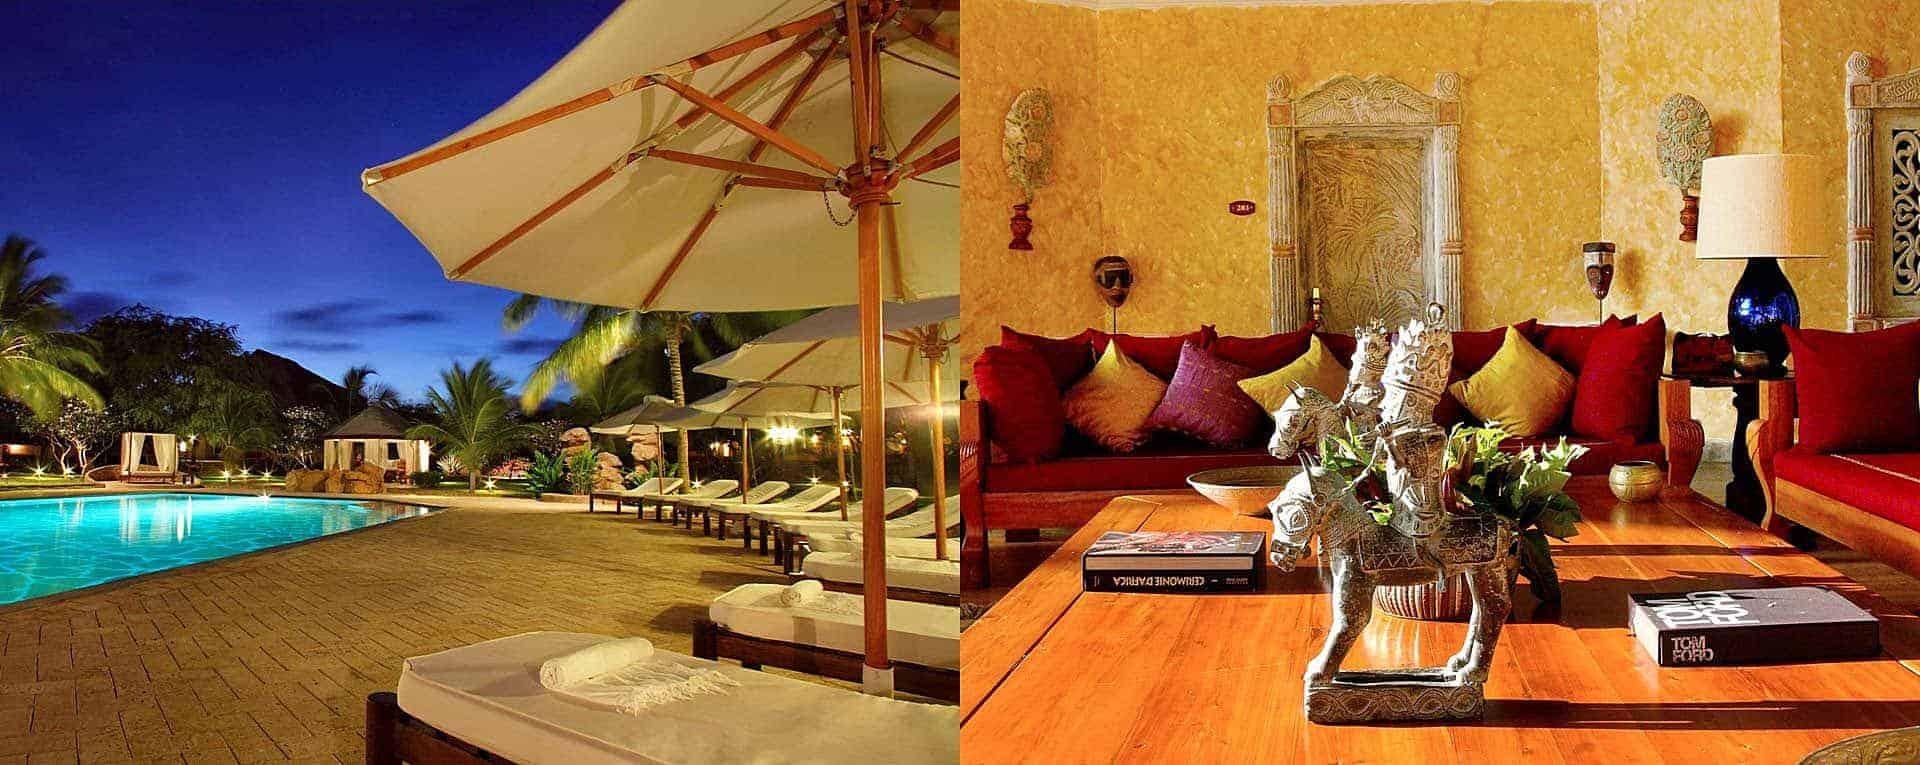 Lion In The Sun Resort Updated 2018 Reviews Parison And 37 Photos Malindi Kenya Tripadvisor